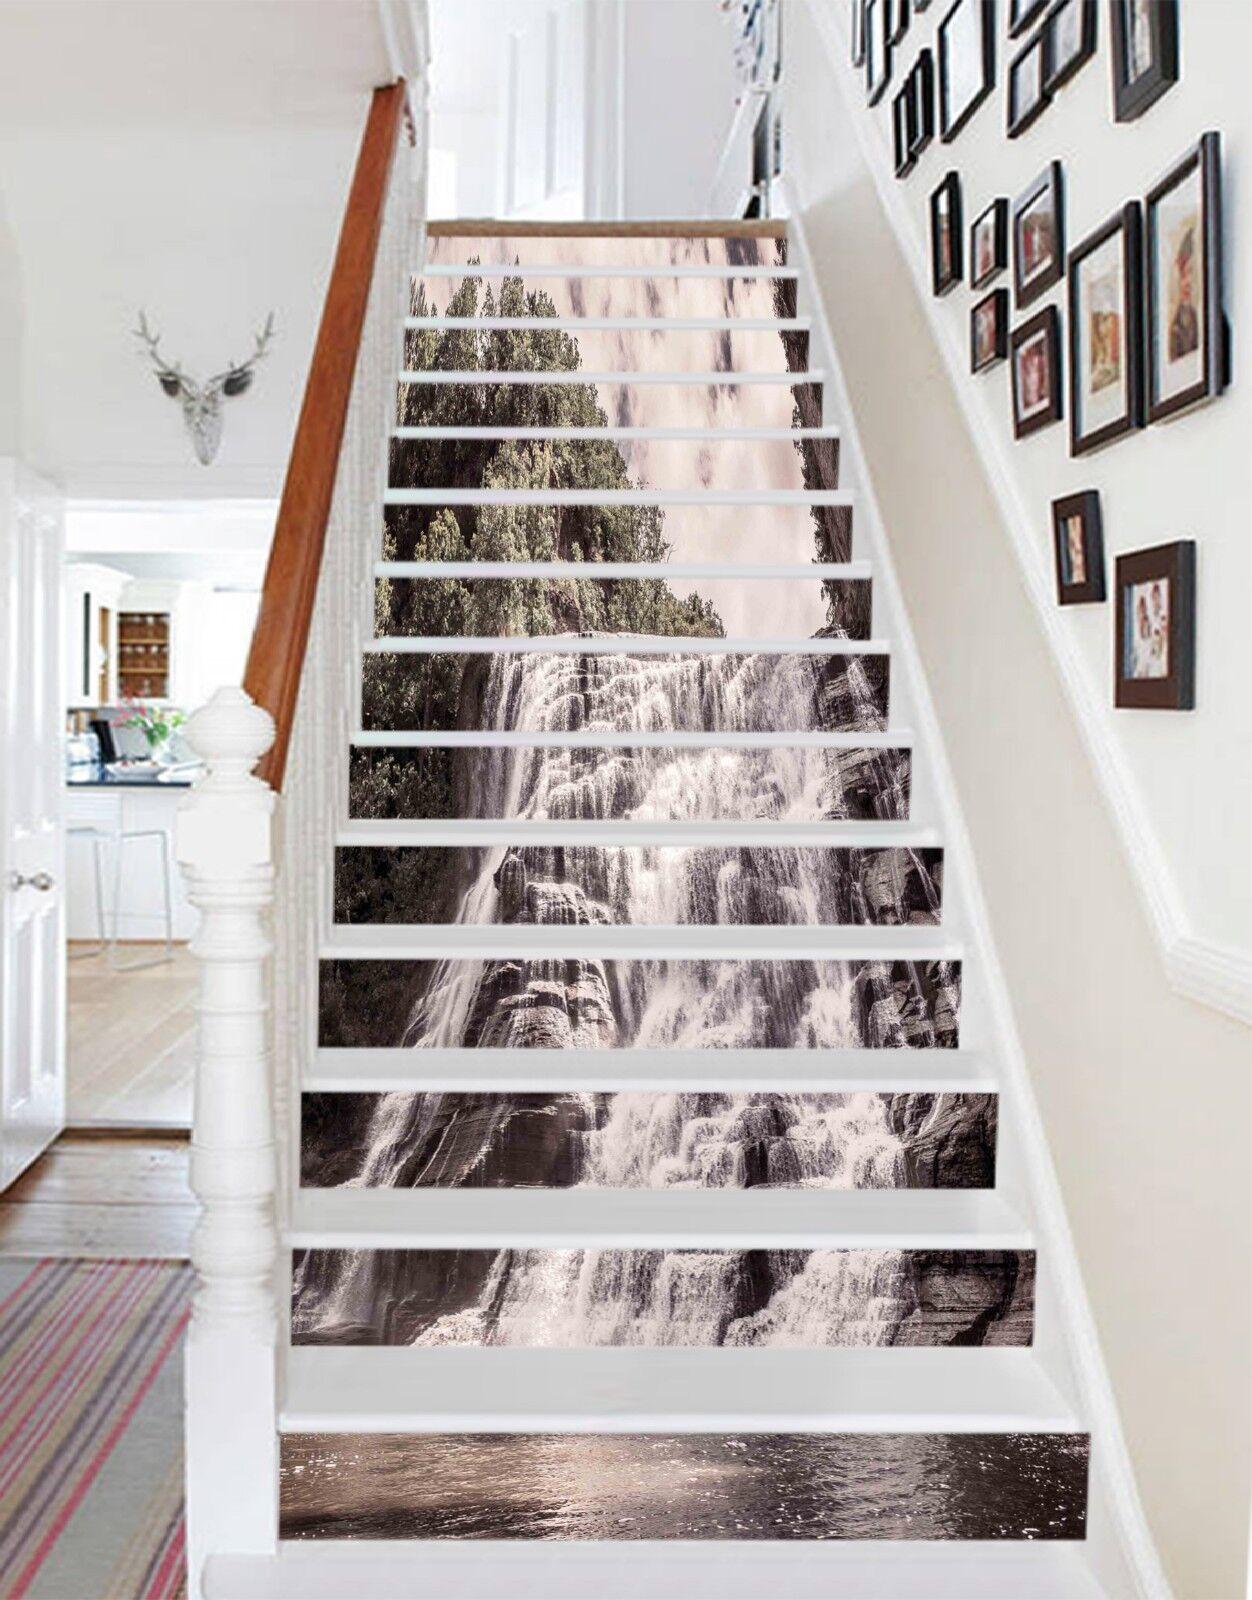 3D Wasserfall 2120 Stair Risers Dekoration Fototapete Vinyl Aufkleber Aufkleber Aufkleber Tapete DE addbfc